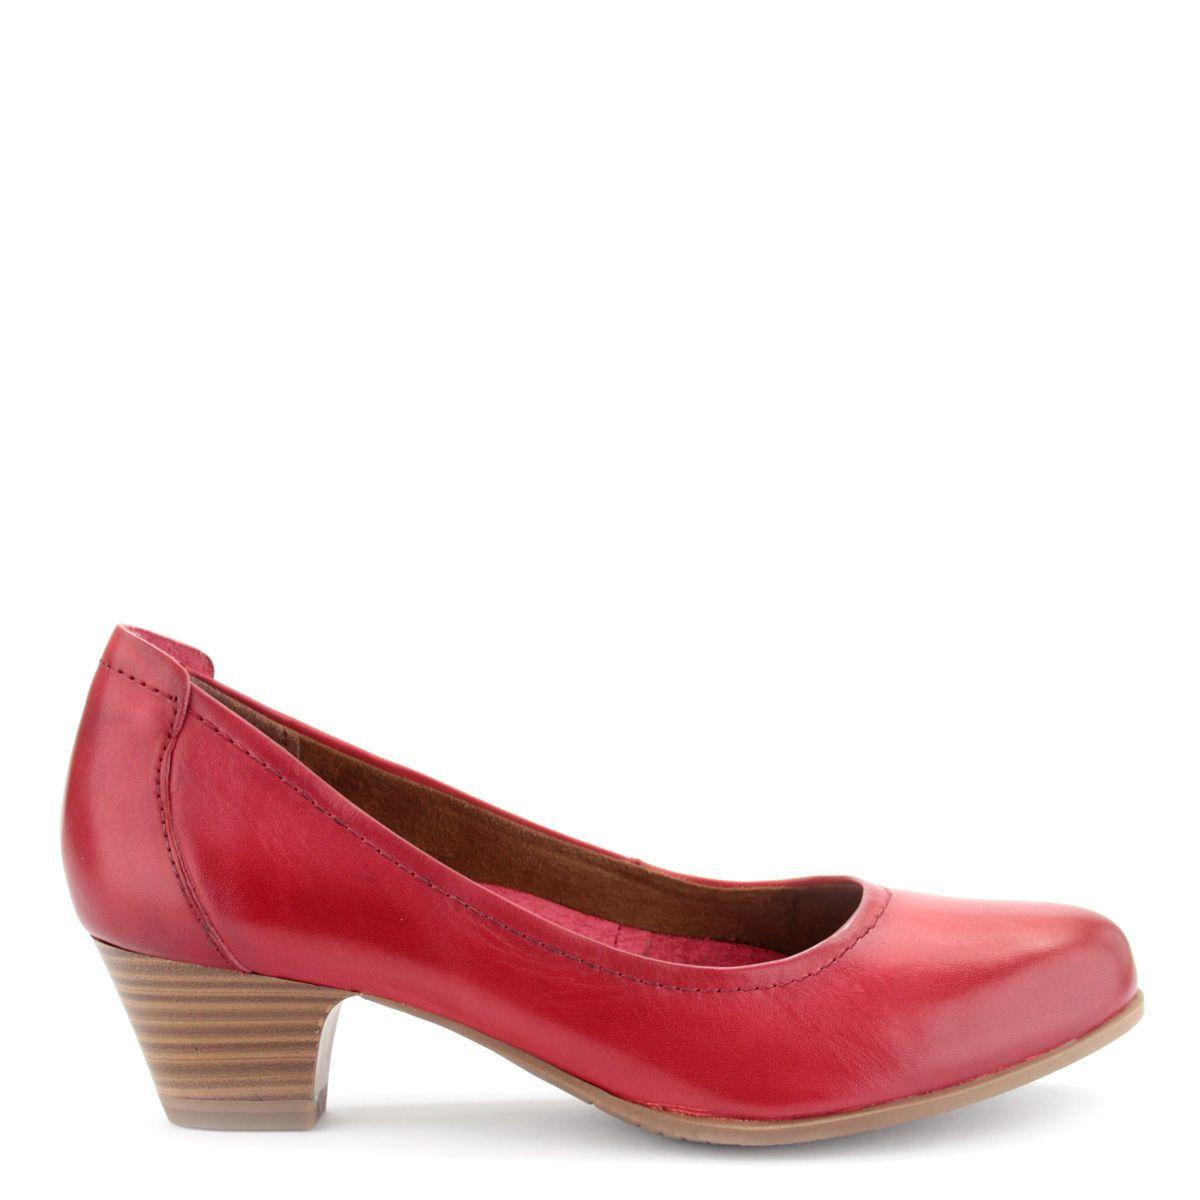 16a29b3837 Piros Tamaris cipő ANTiShokk sarokkal | ChiX.hu cipő webáruház Klasszikus  fazonú piros Tamaris cipő 4 cm magas ANTiShokk sarokkal, memóriahabos Touch  It ...